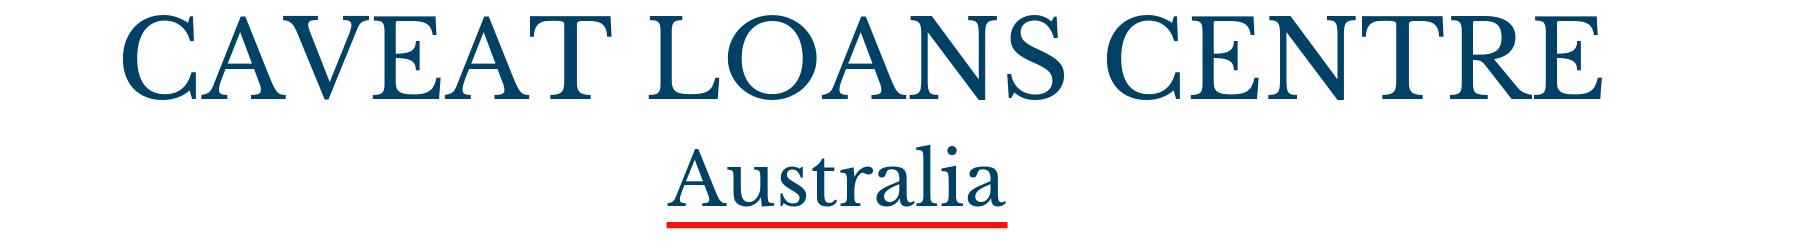 Caveat Loans Lenders Australia